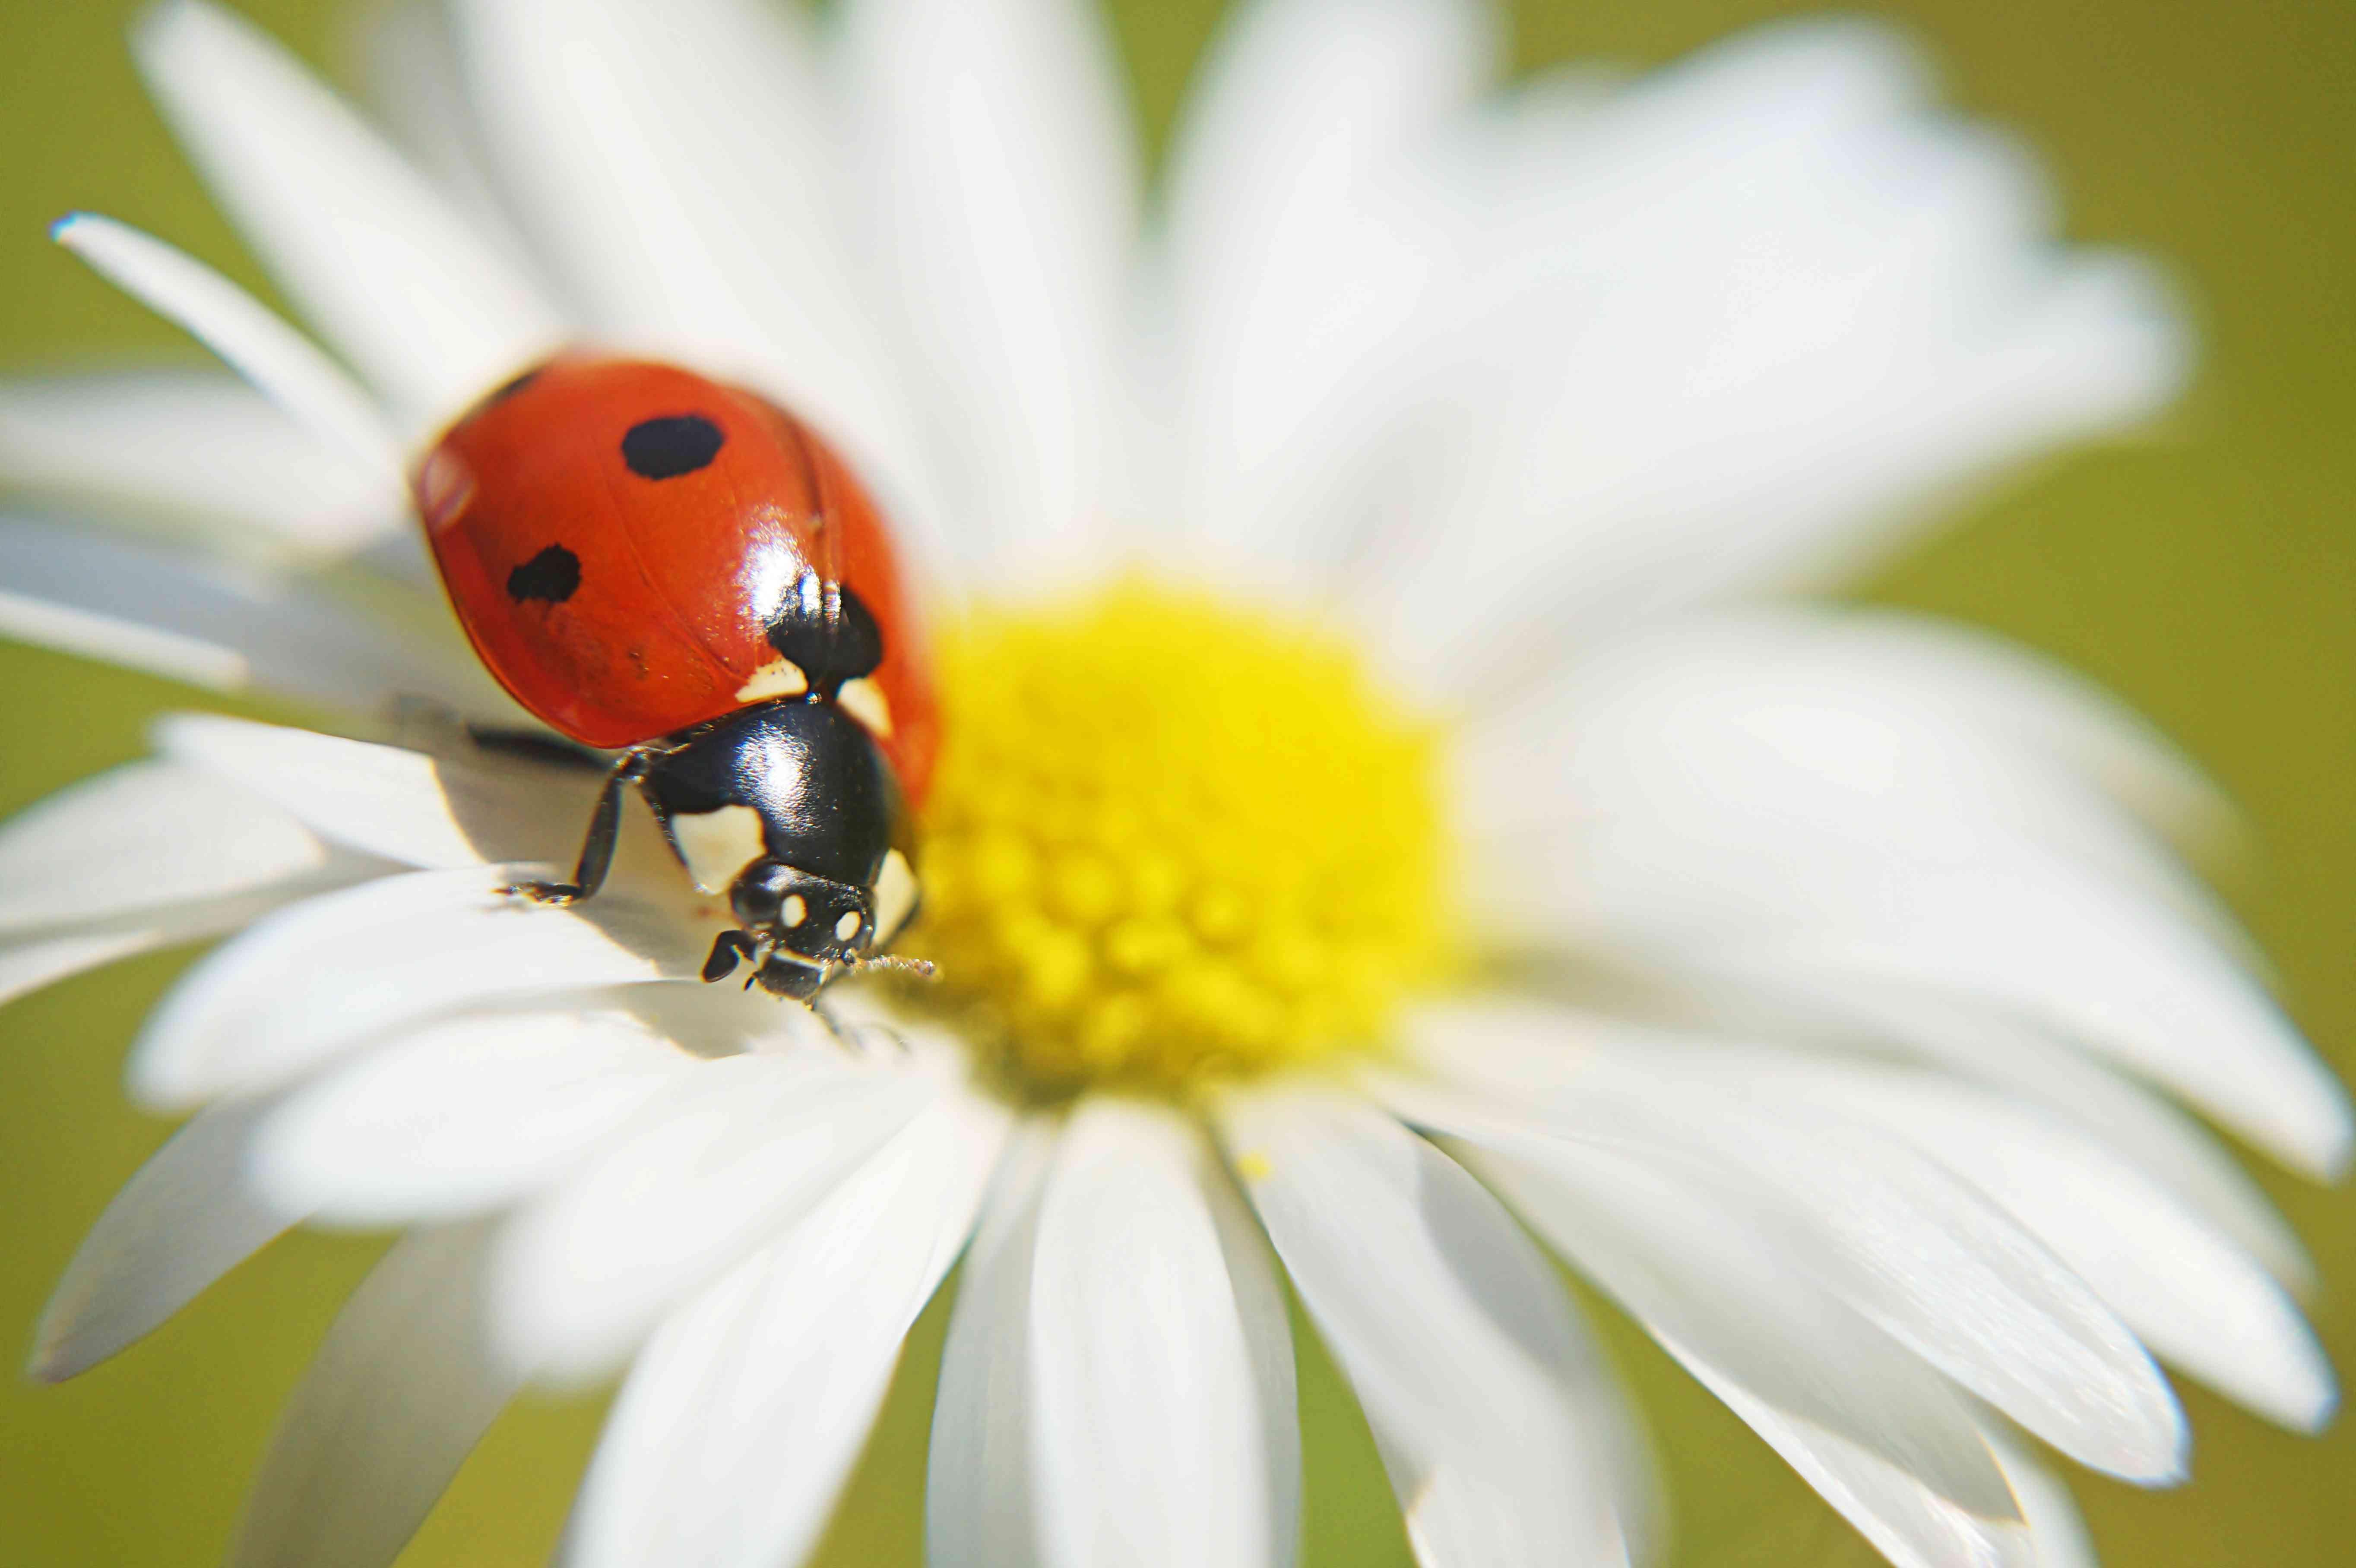 Close-up of a ladybug walking on a daisy